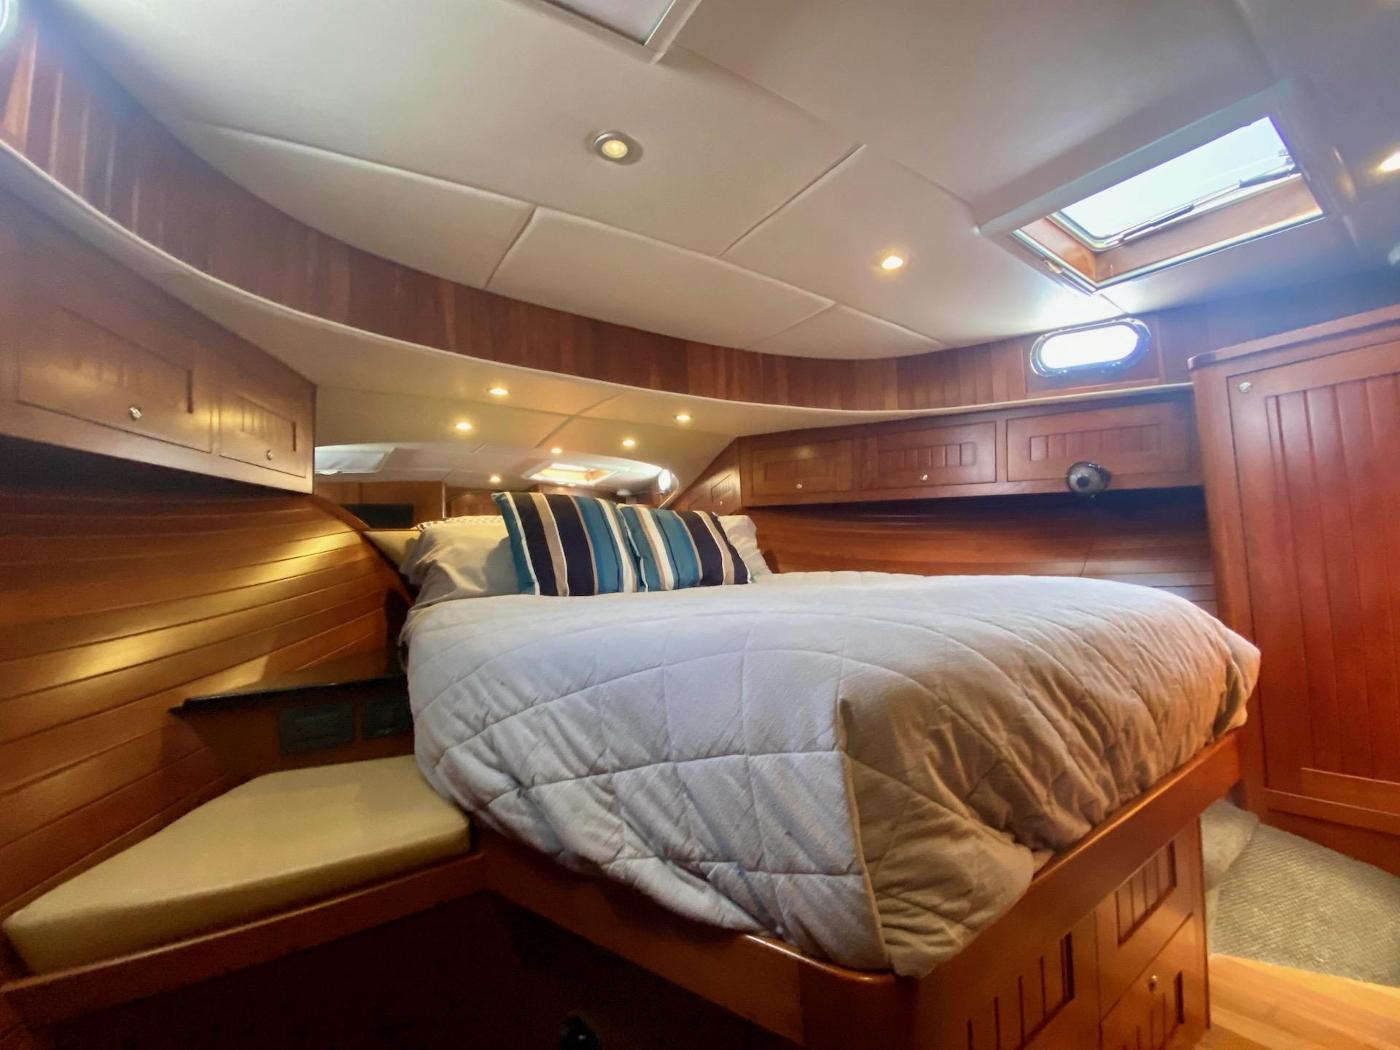 2010 Bracewell 41, Forward Cabin 8